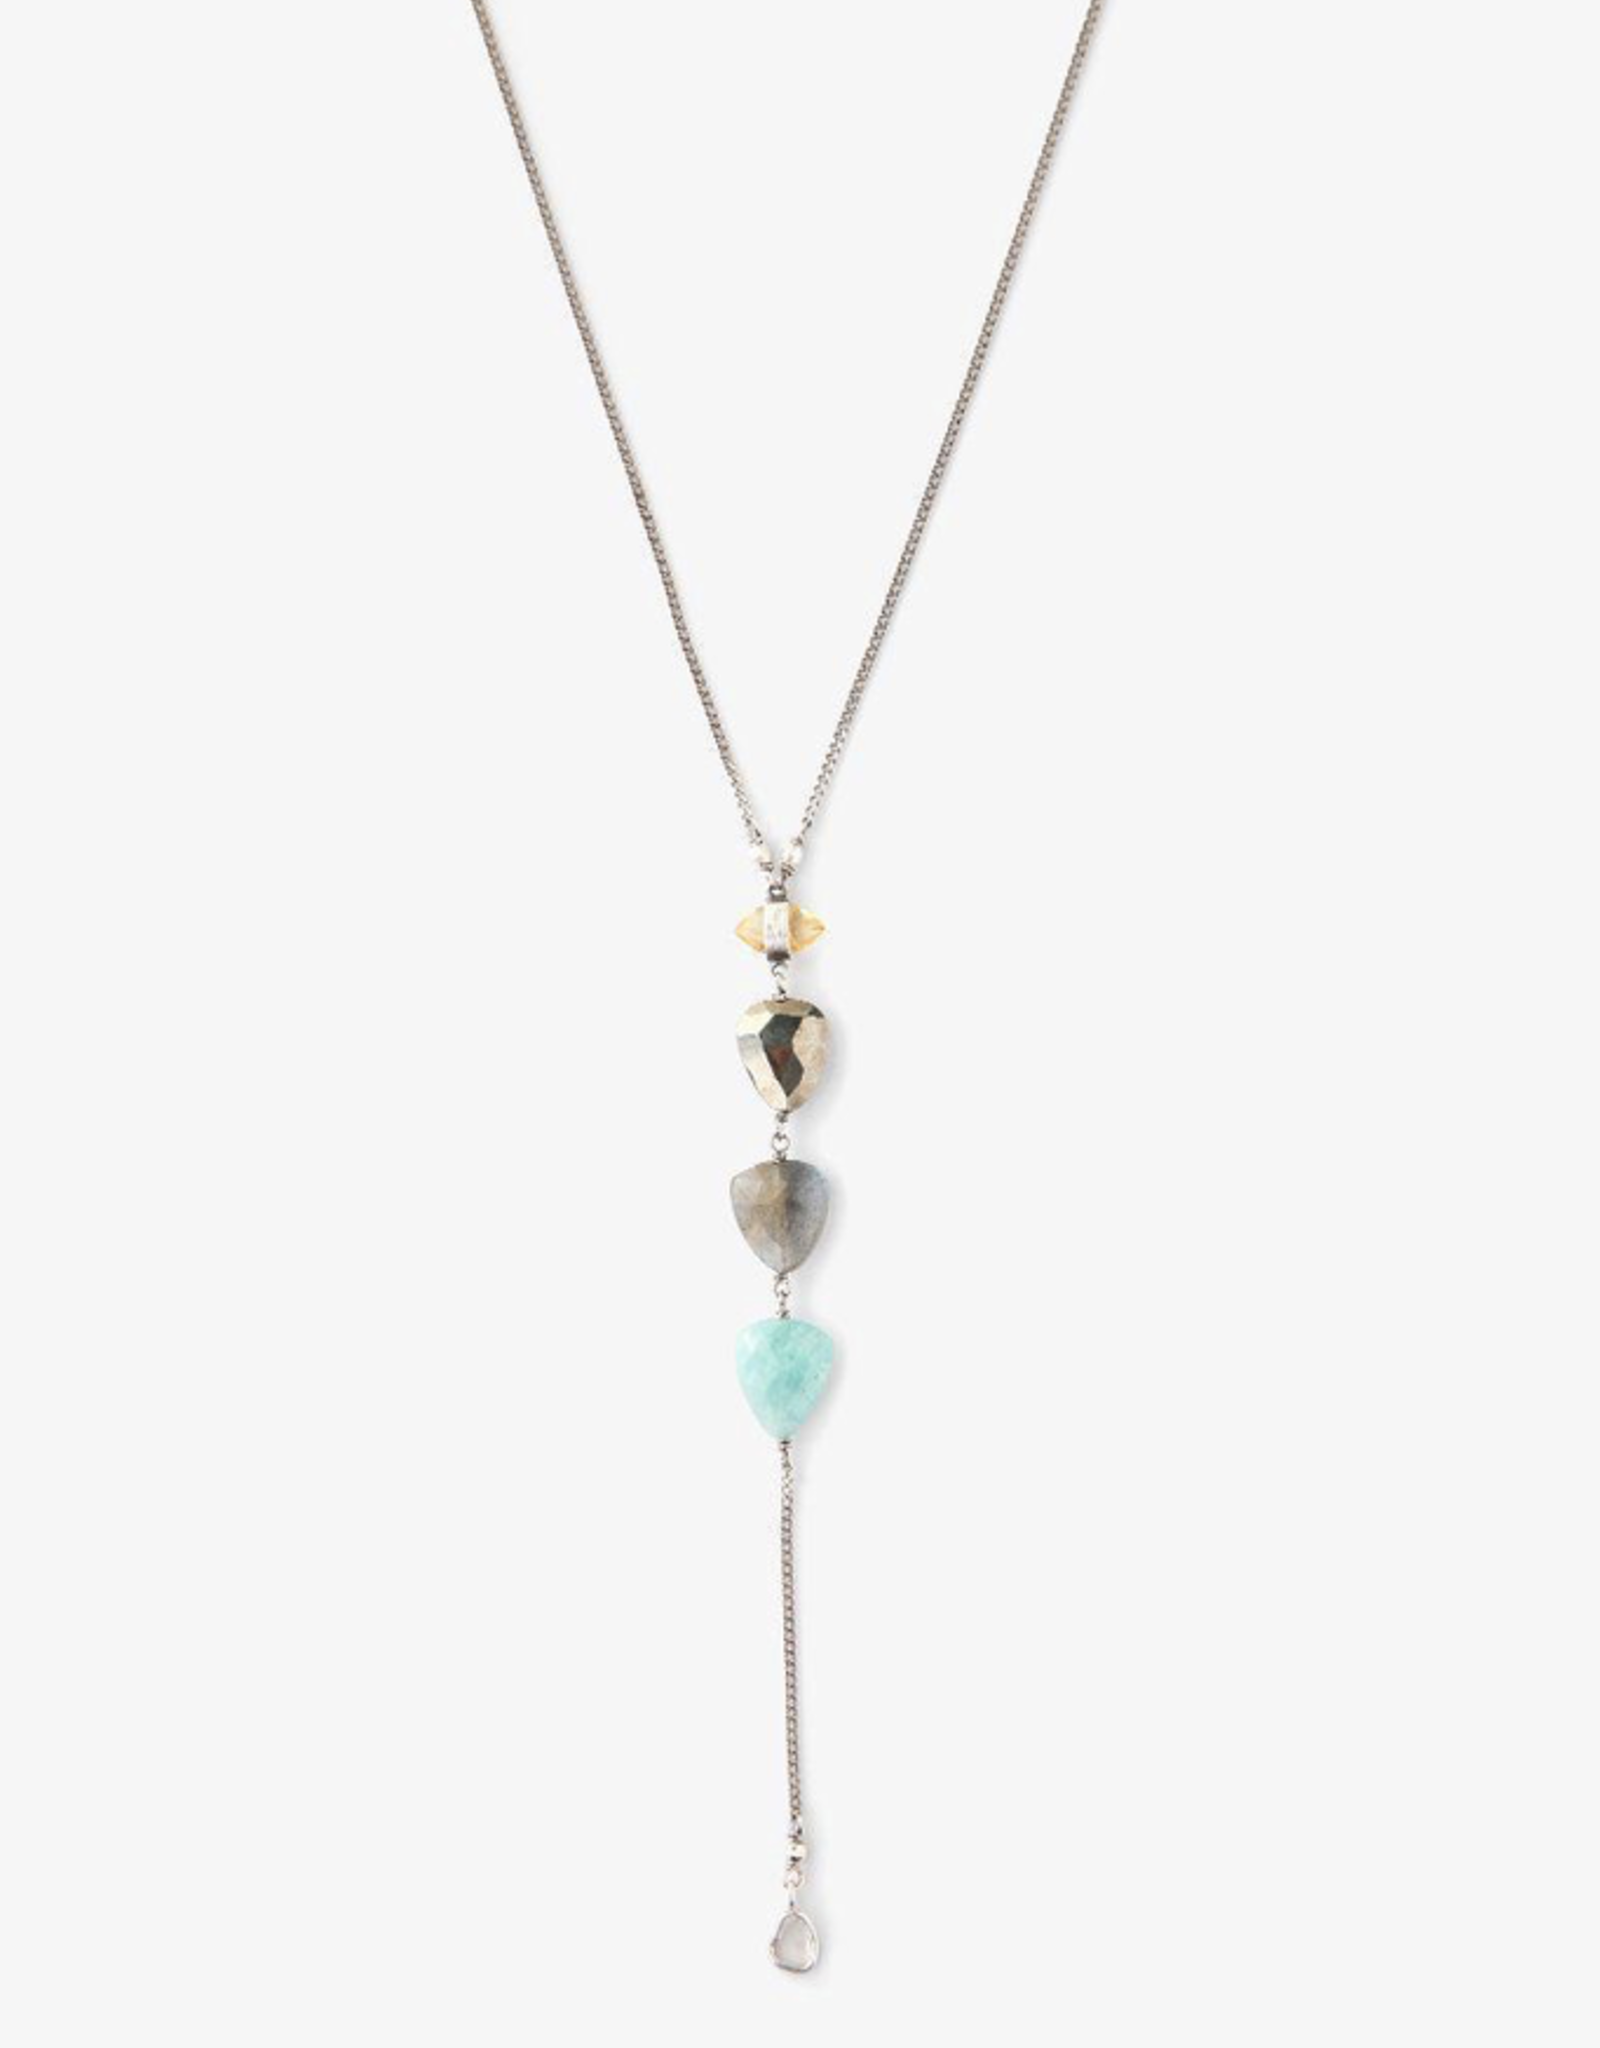 Necklaces Chan Luu - Tiered Amazonite Mix Y Necklace